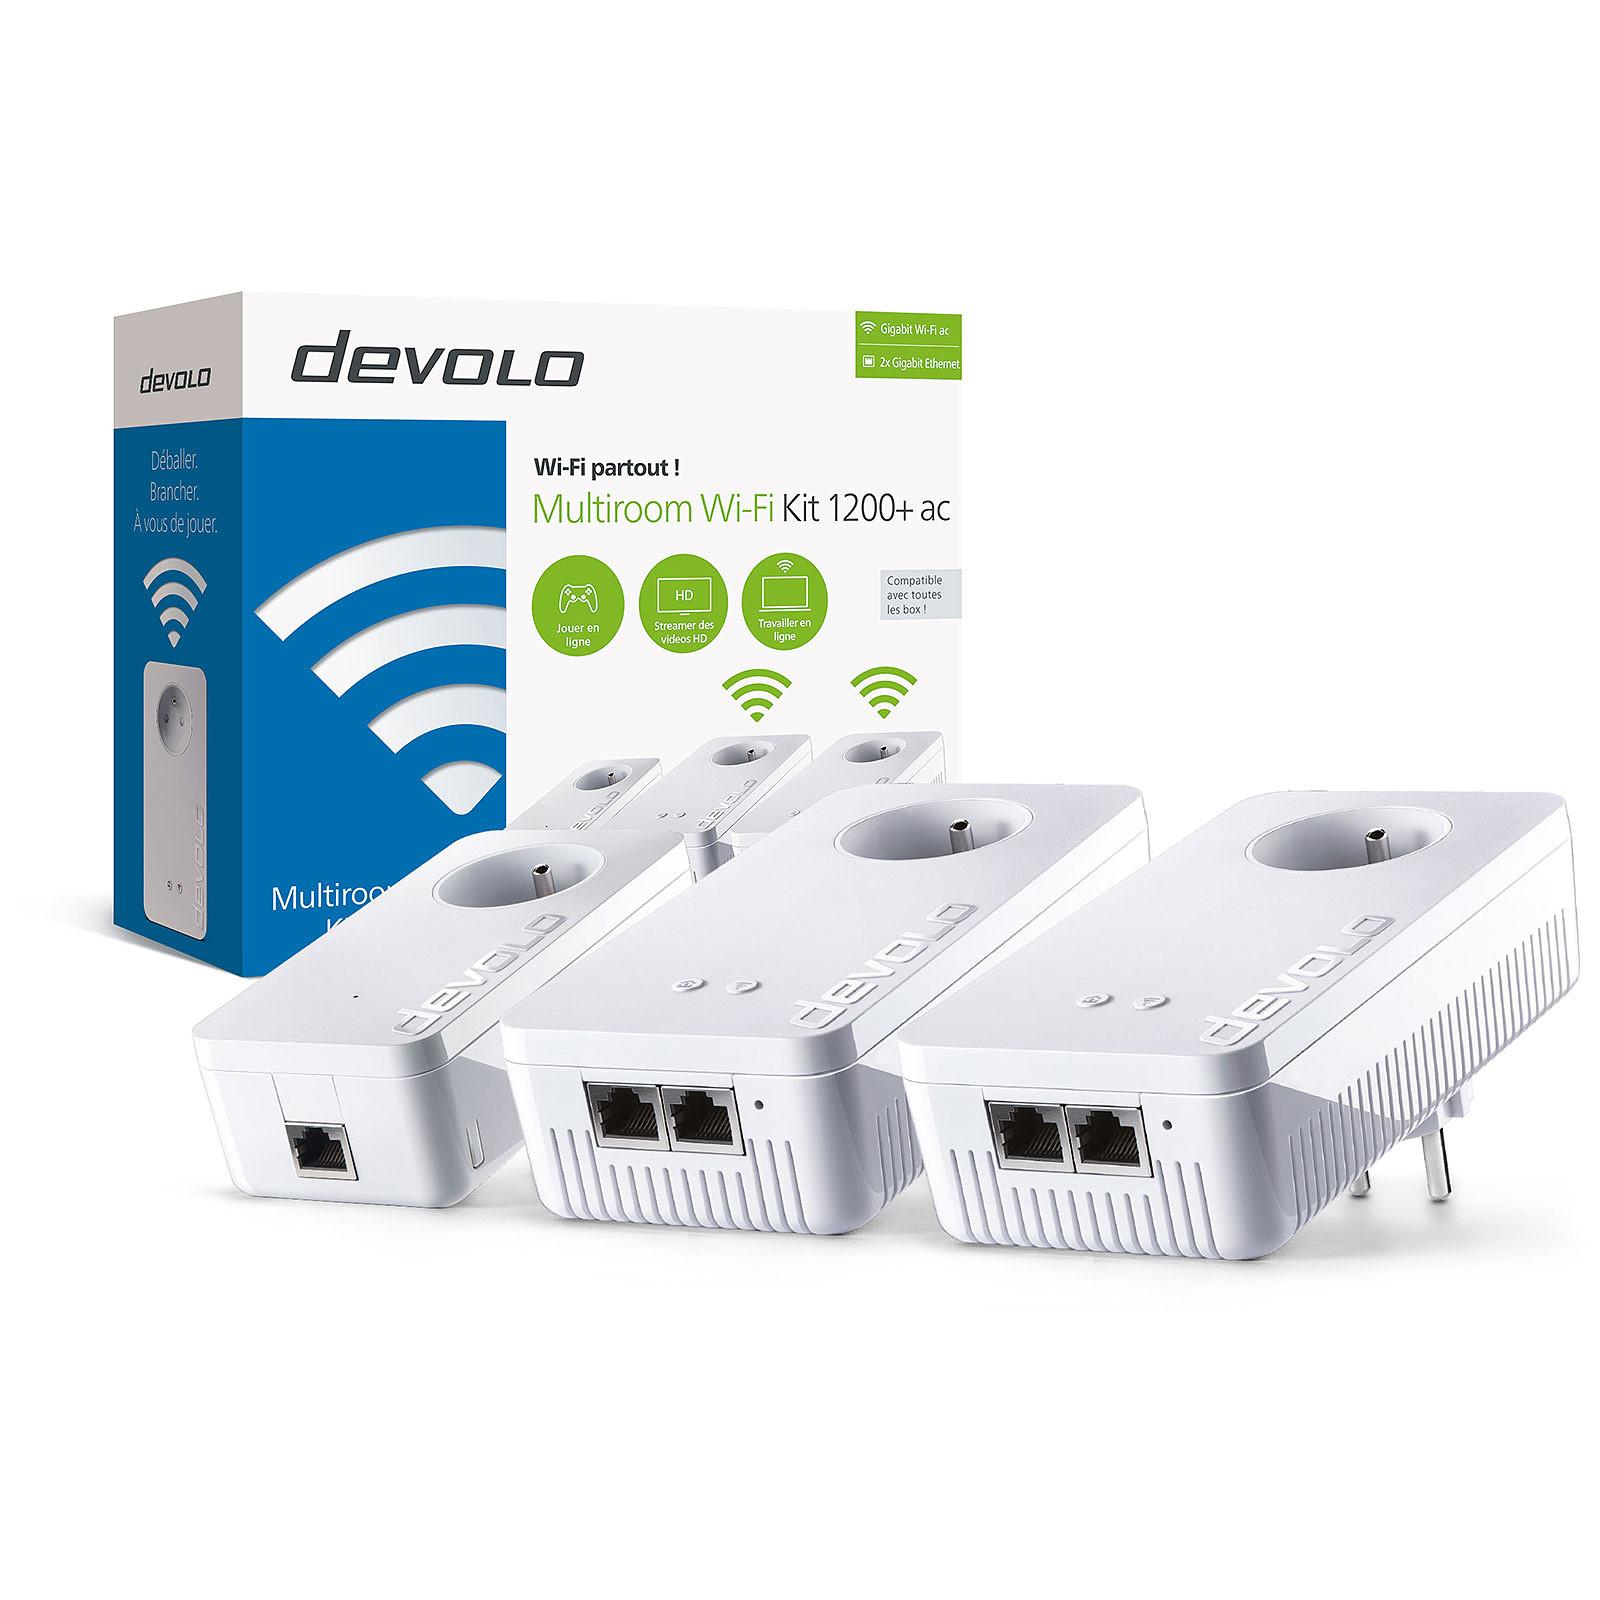 Devolo Multiroom Wi-Fi Kit 1200+ ac